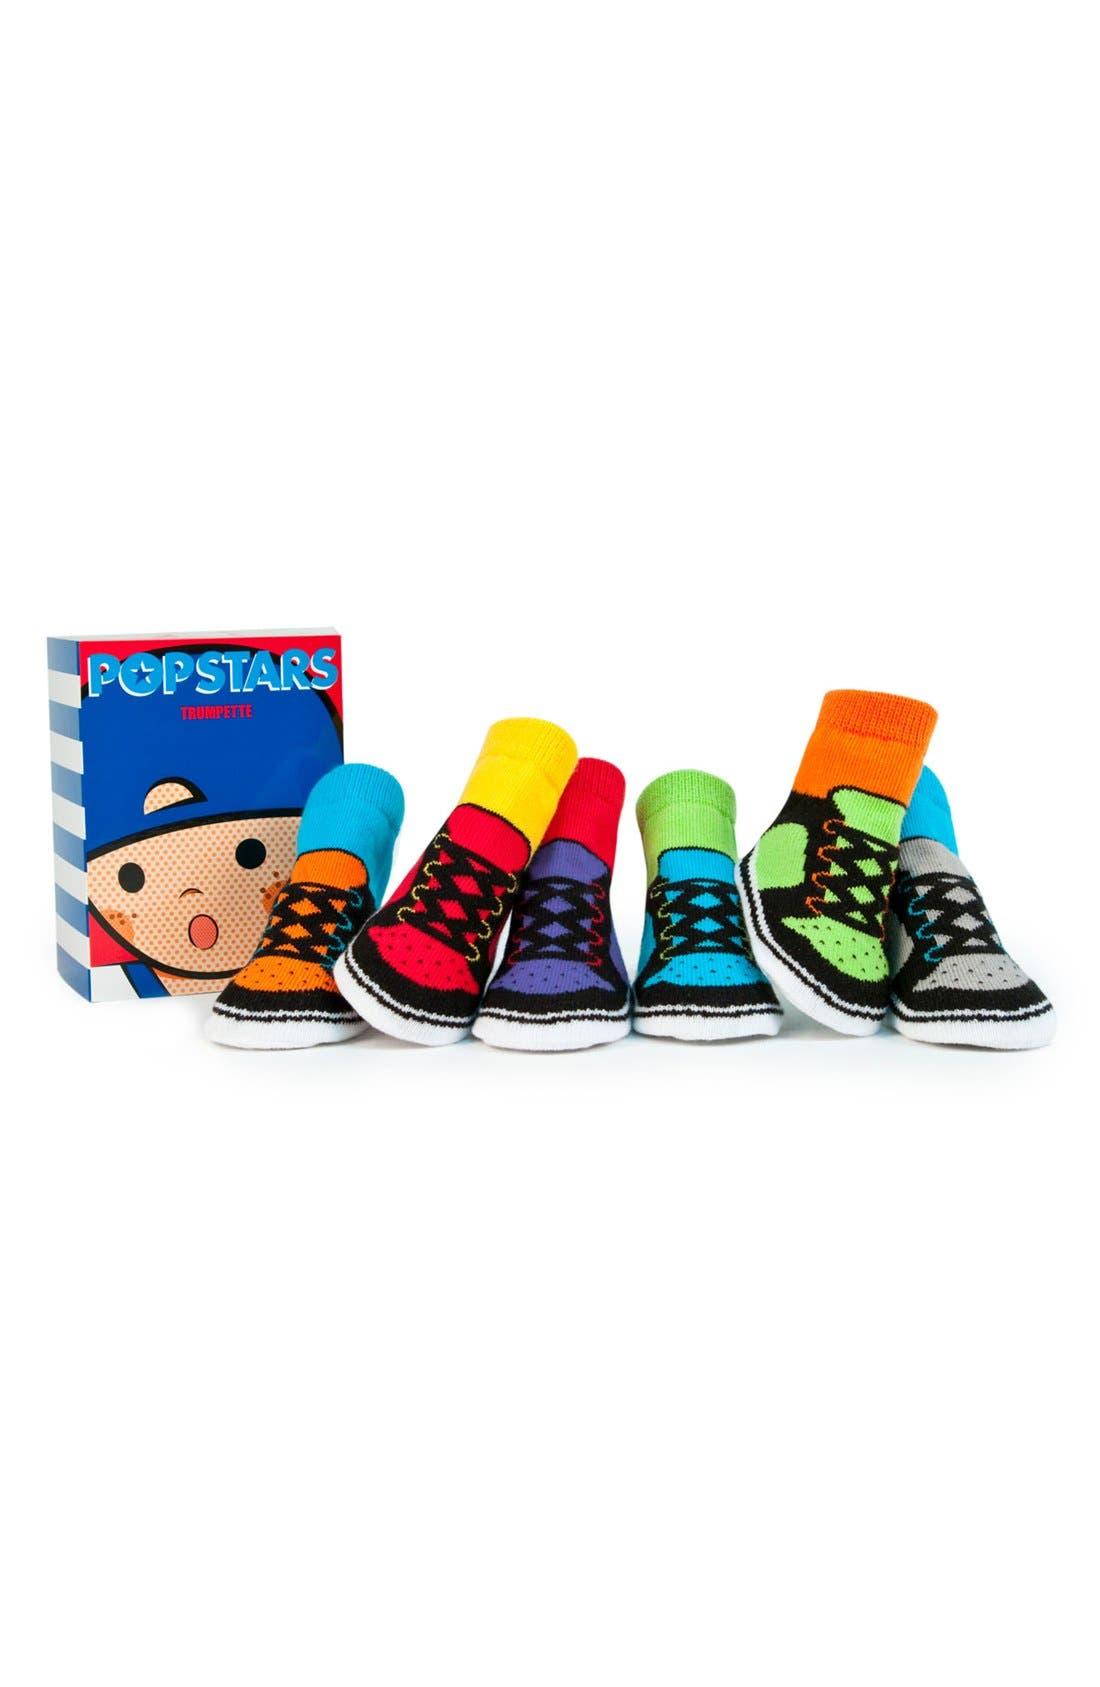 Main Image - Trumpette 'Pop Stars' Socks Gift Set (6-Pack)(Baby Boys)